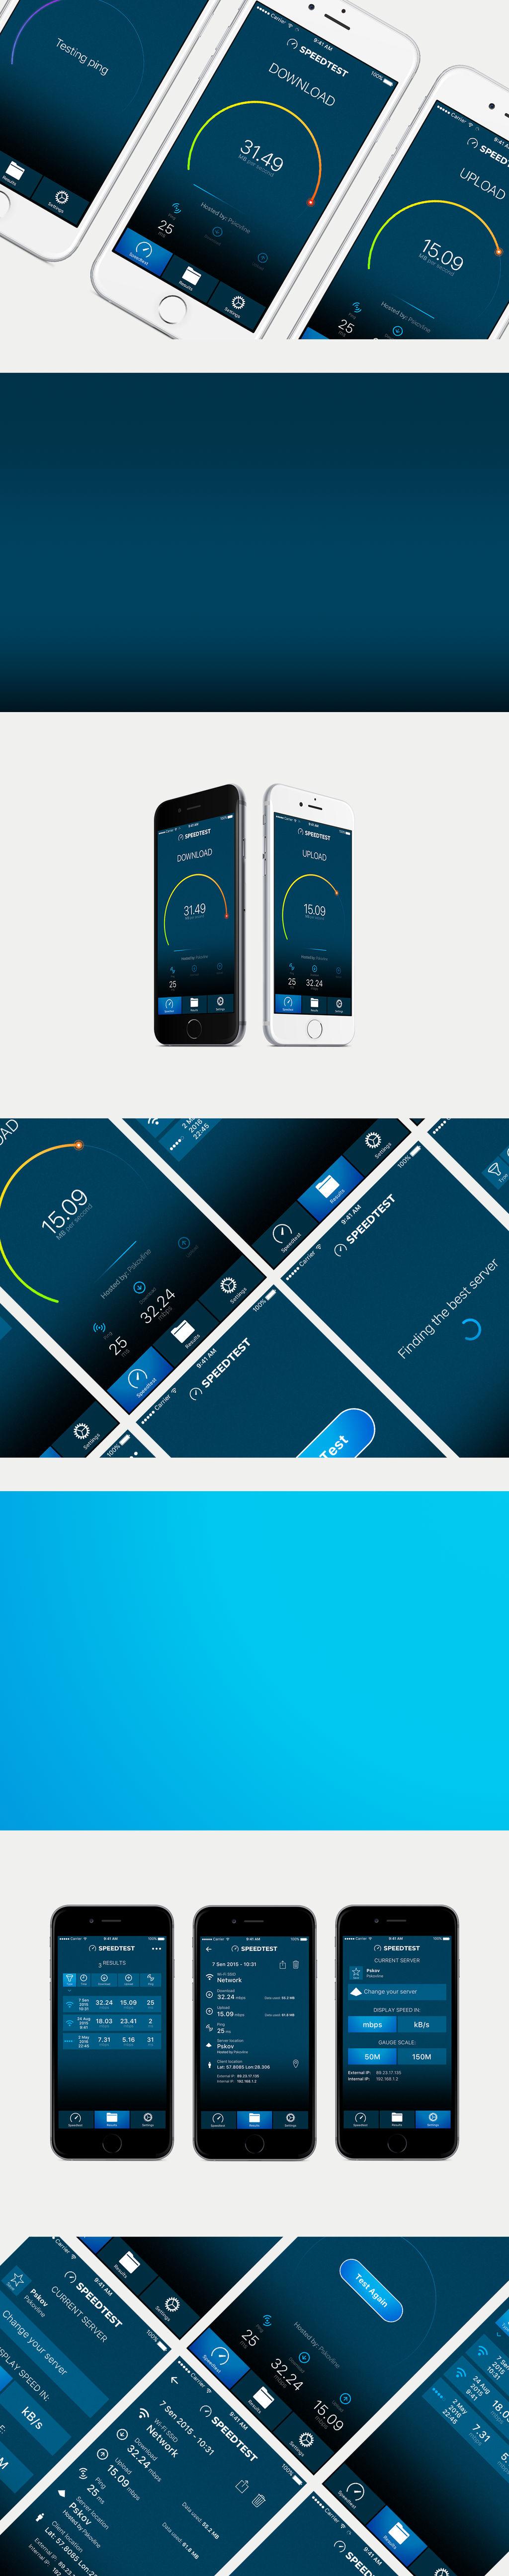 Speedtest - iOS